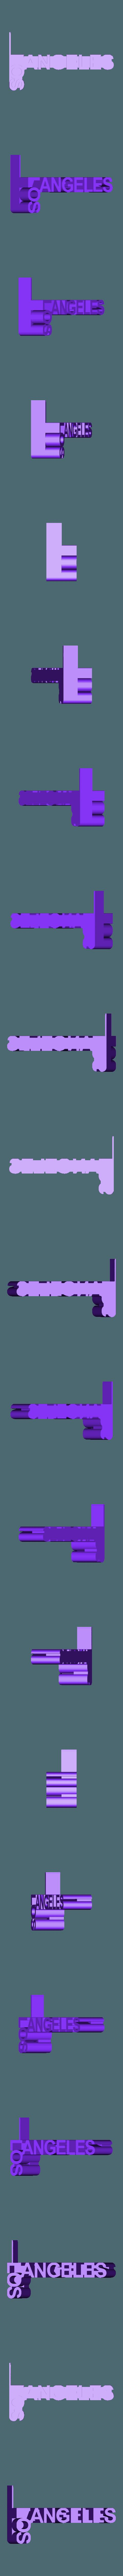 LA Bookends_ Right.stl Download free STL file LA Bookends • Template to 3D print, Hom3d